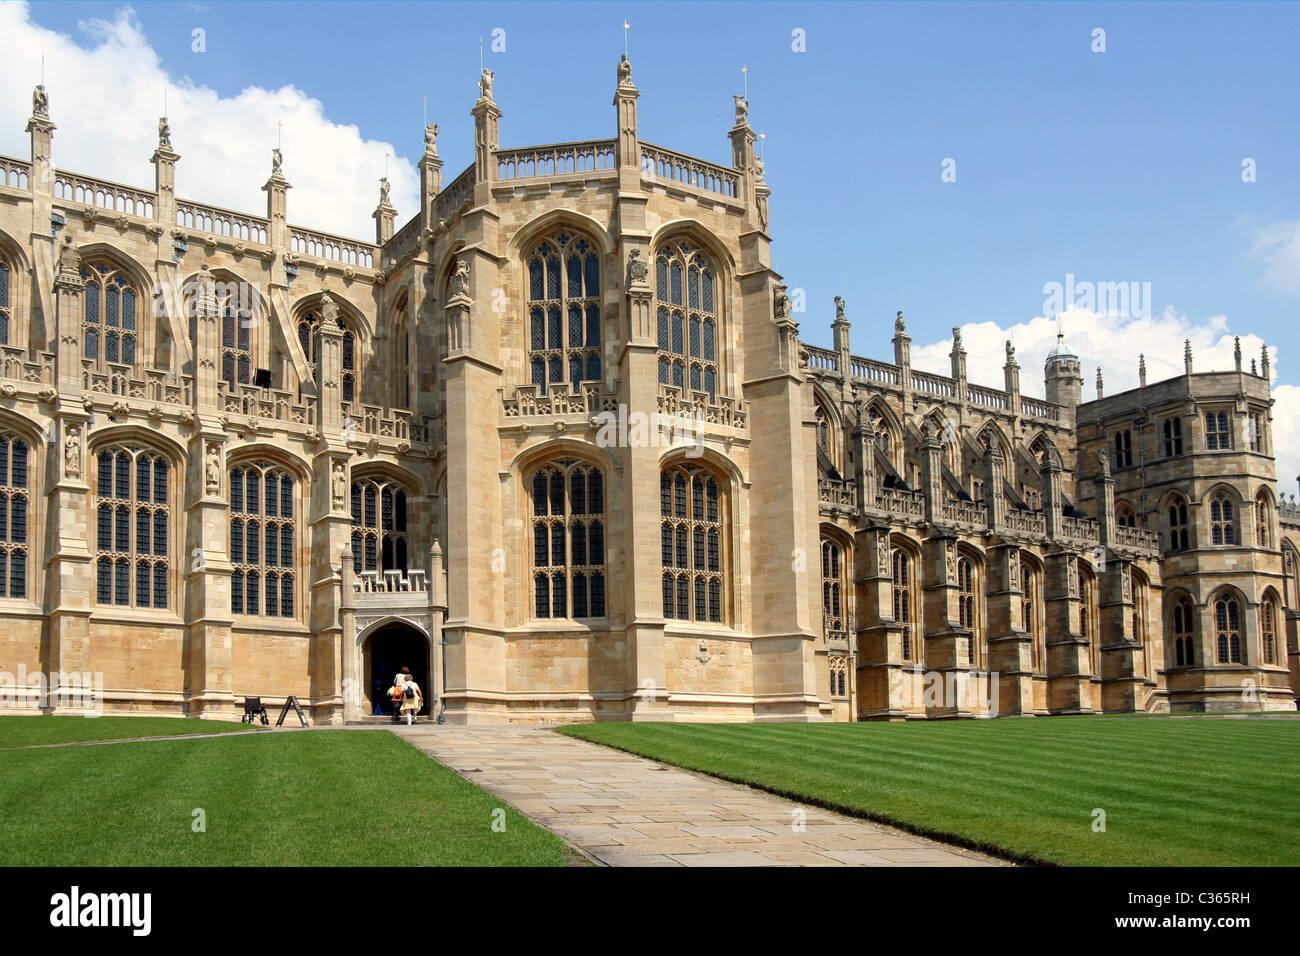 Windsor castle 365